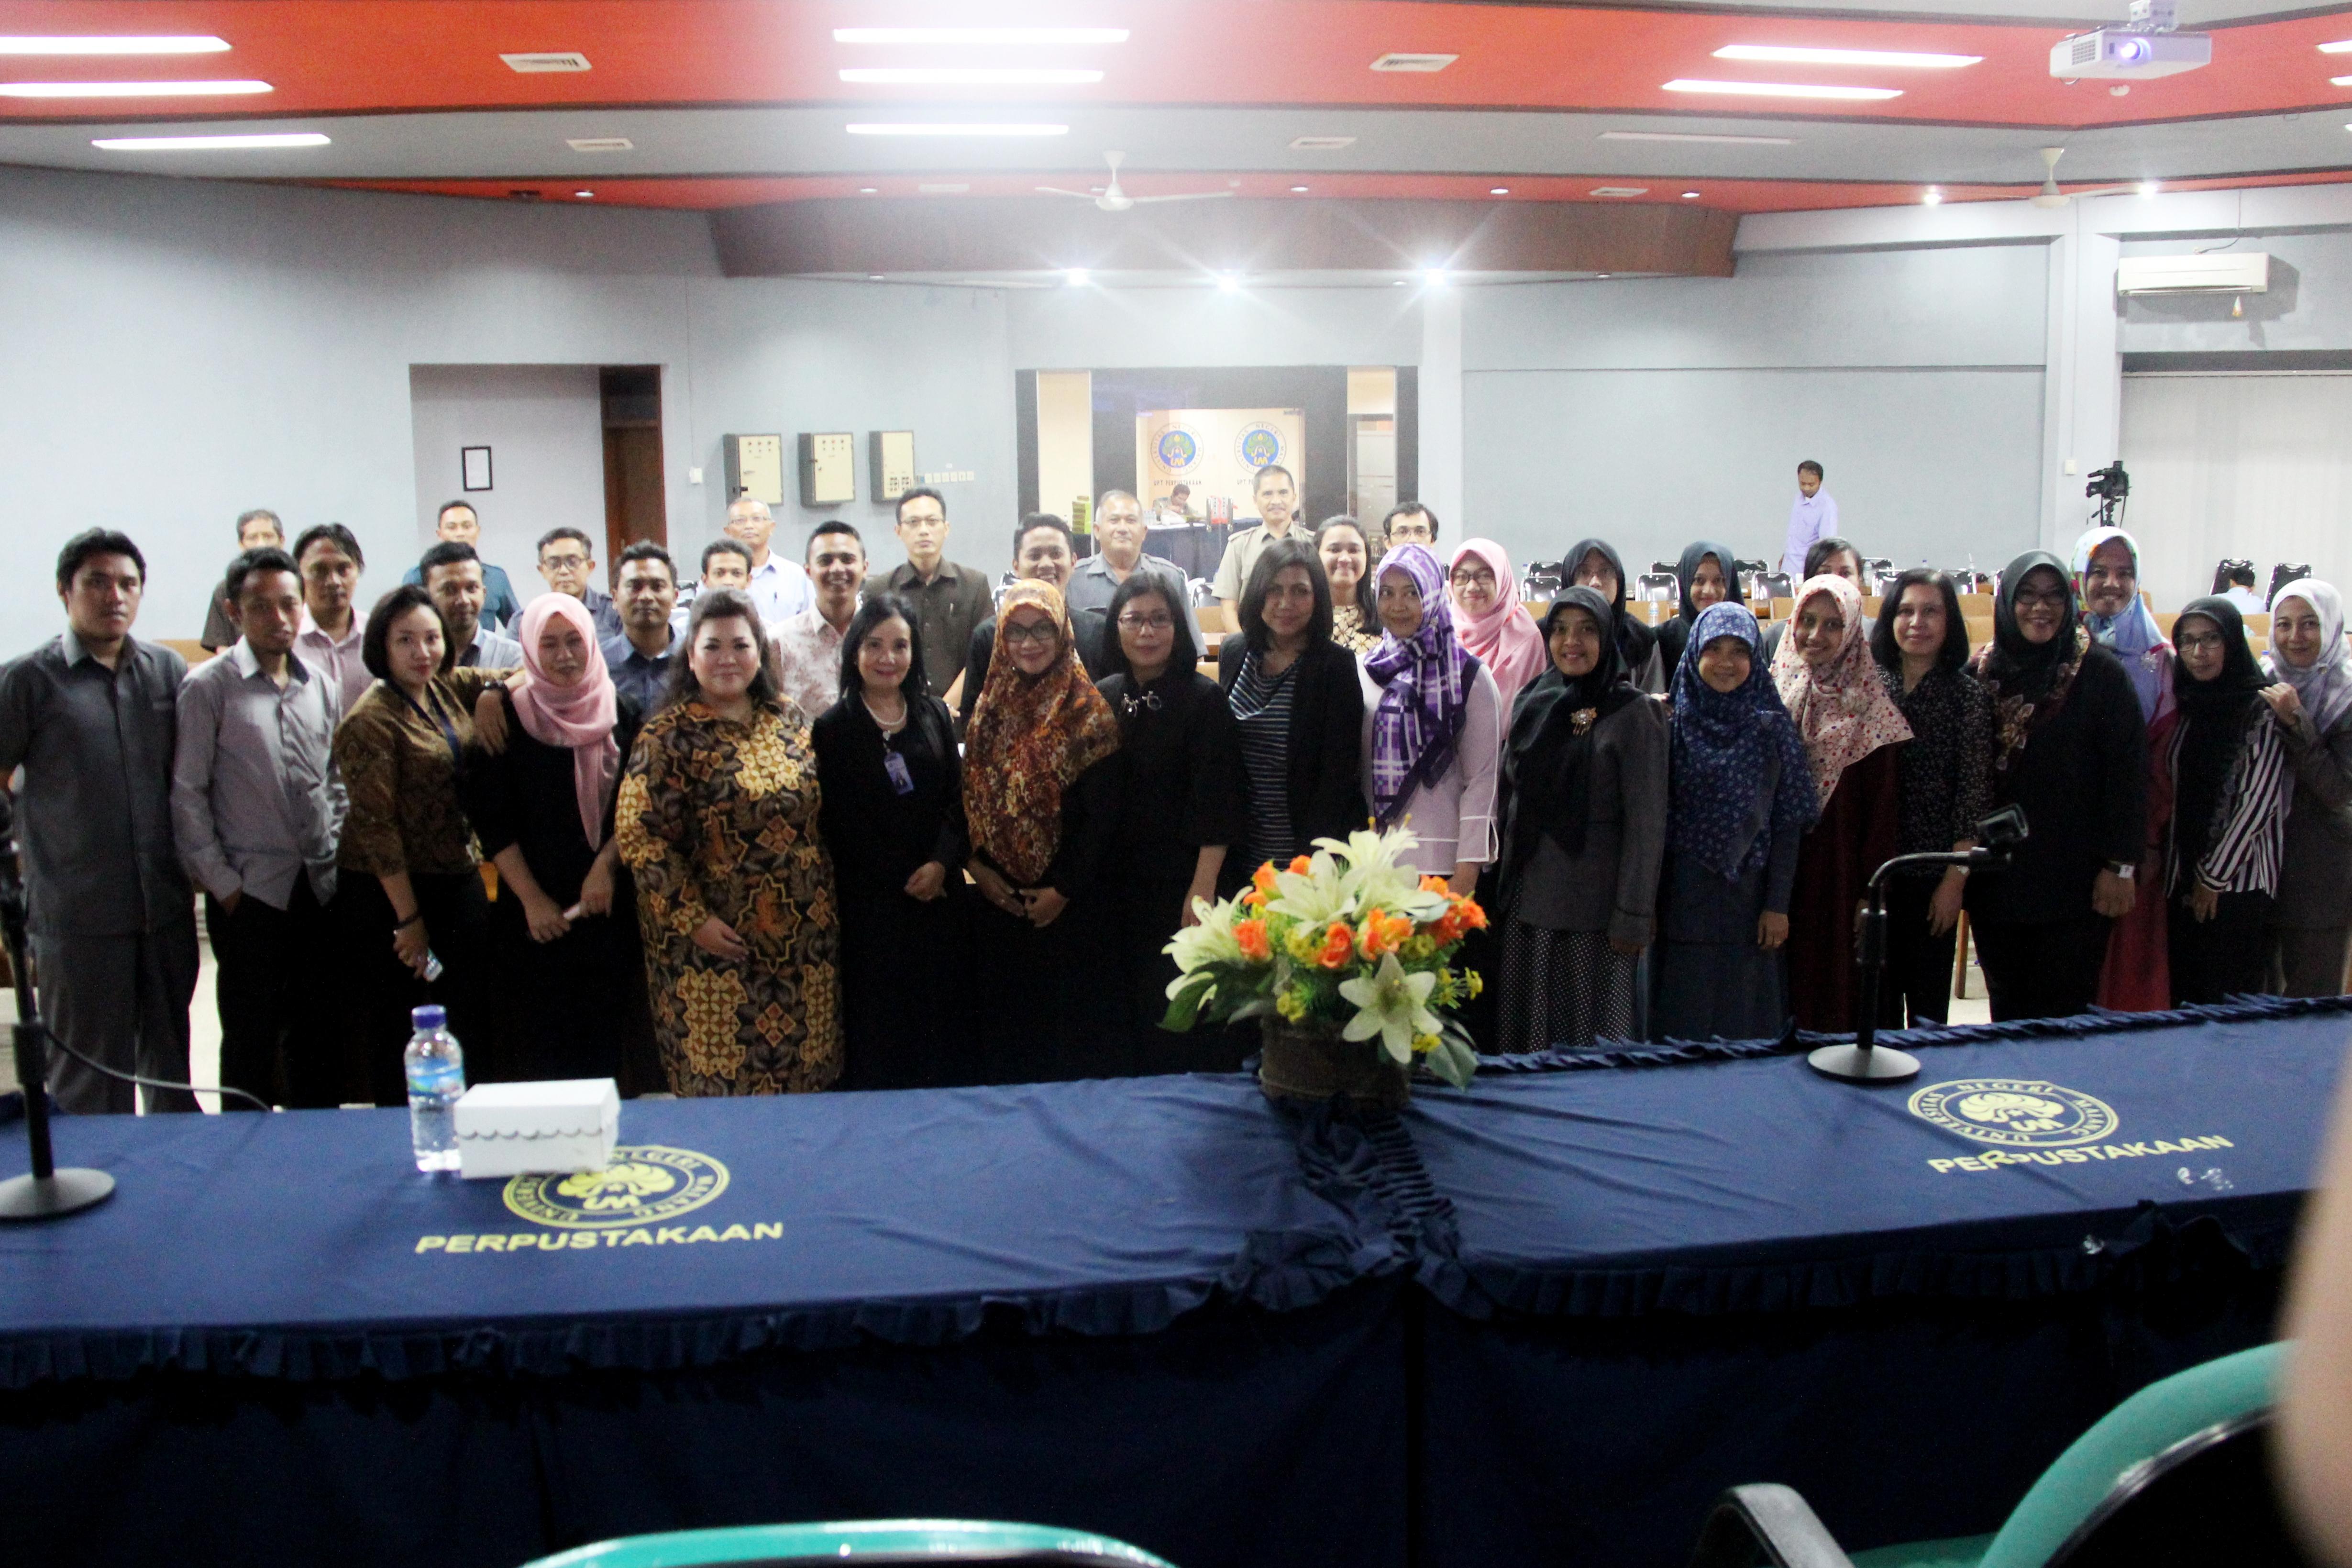 Rapat Kerja Peningkatan Kualitas SDM sekaligus Sosialisasi Penanganan Aplikasi Lapor Universitas Negeri Malang (UM)